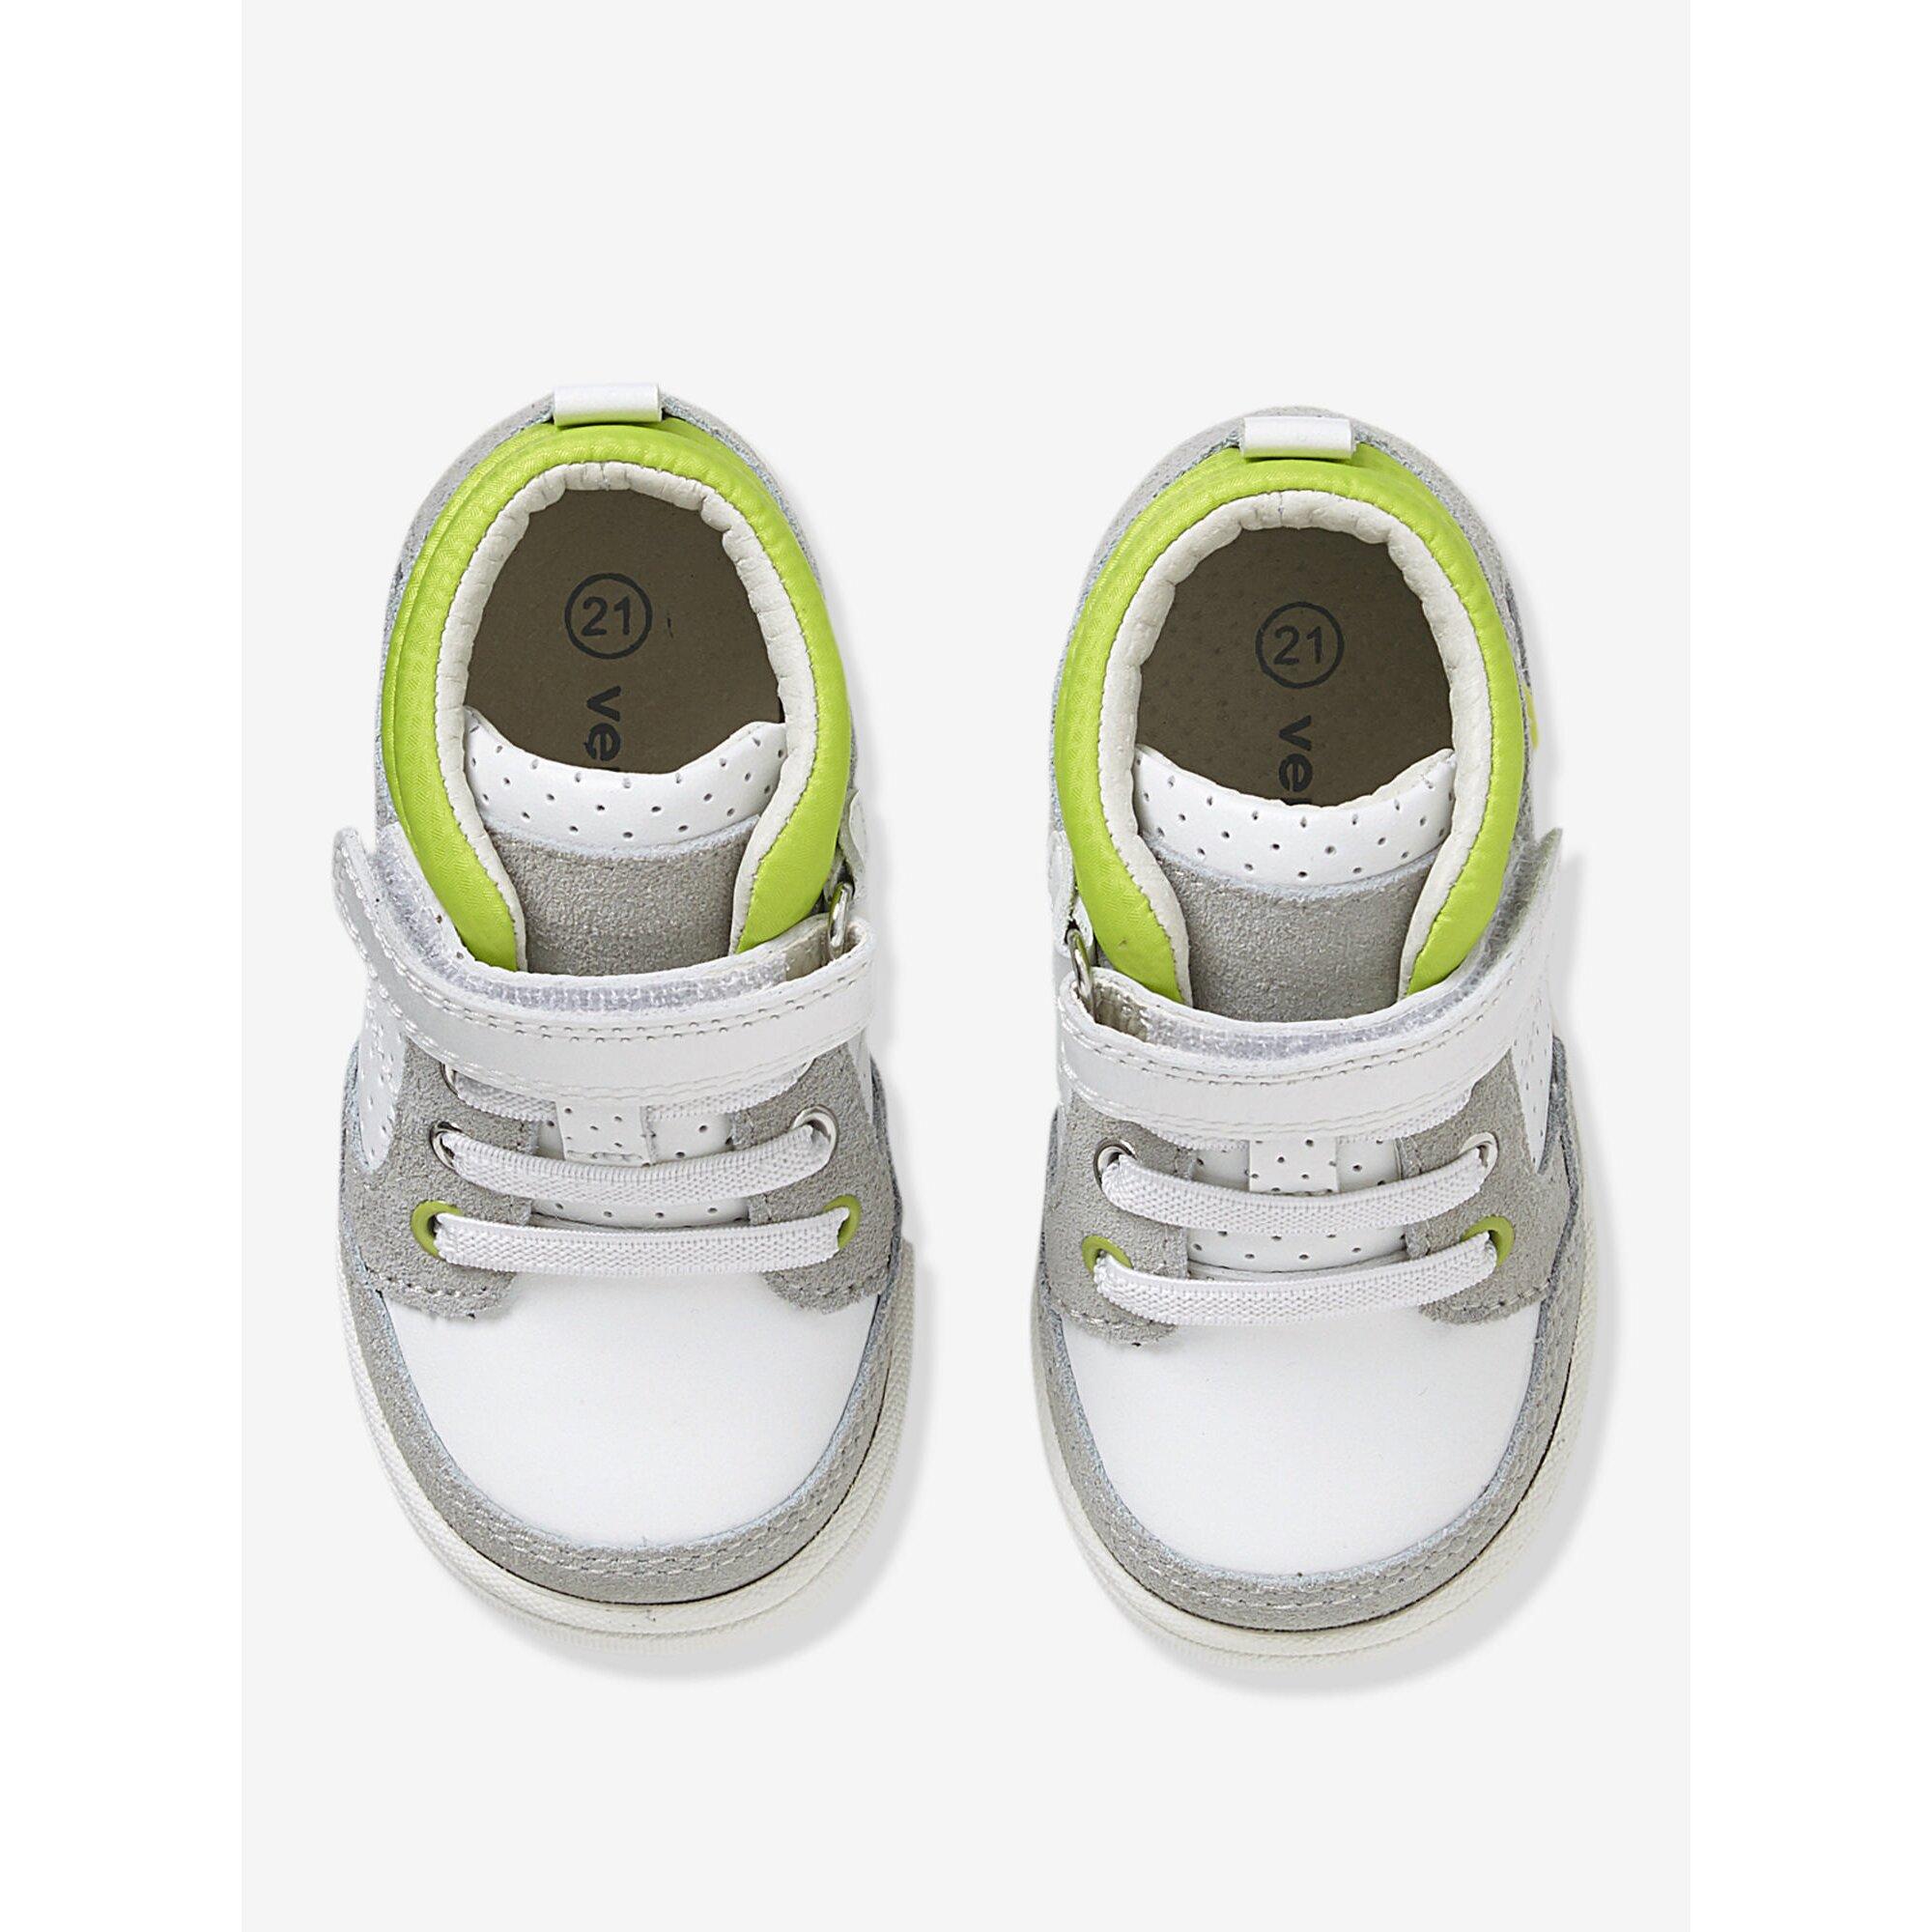 vertbaudet-hohe-sneakers-fur-jungen-leder